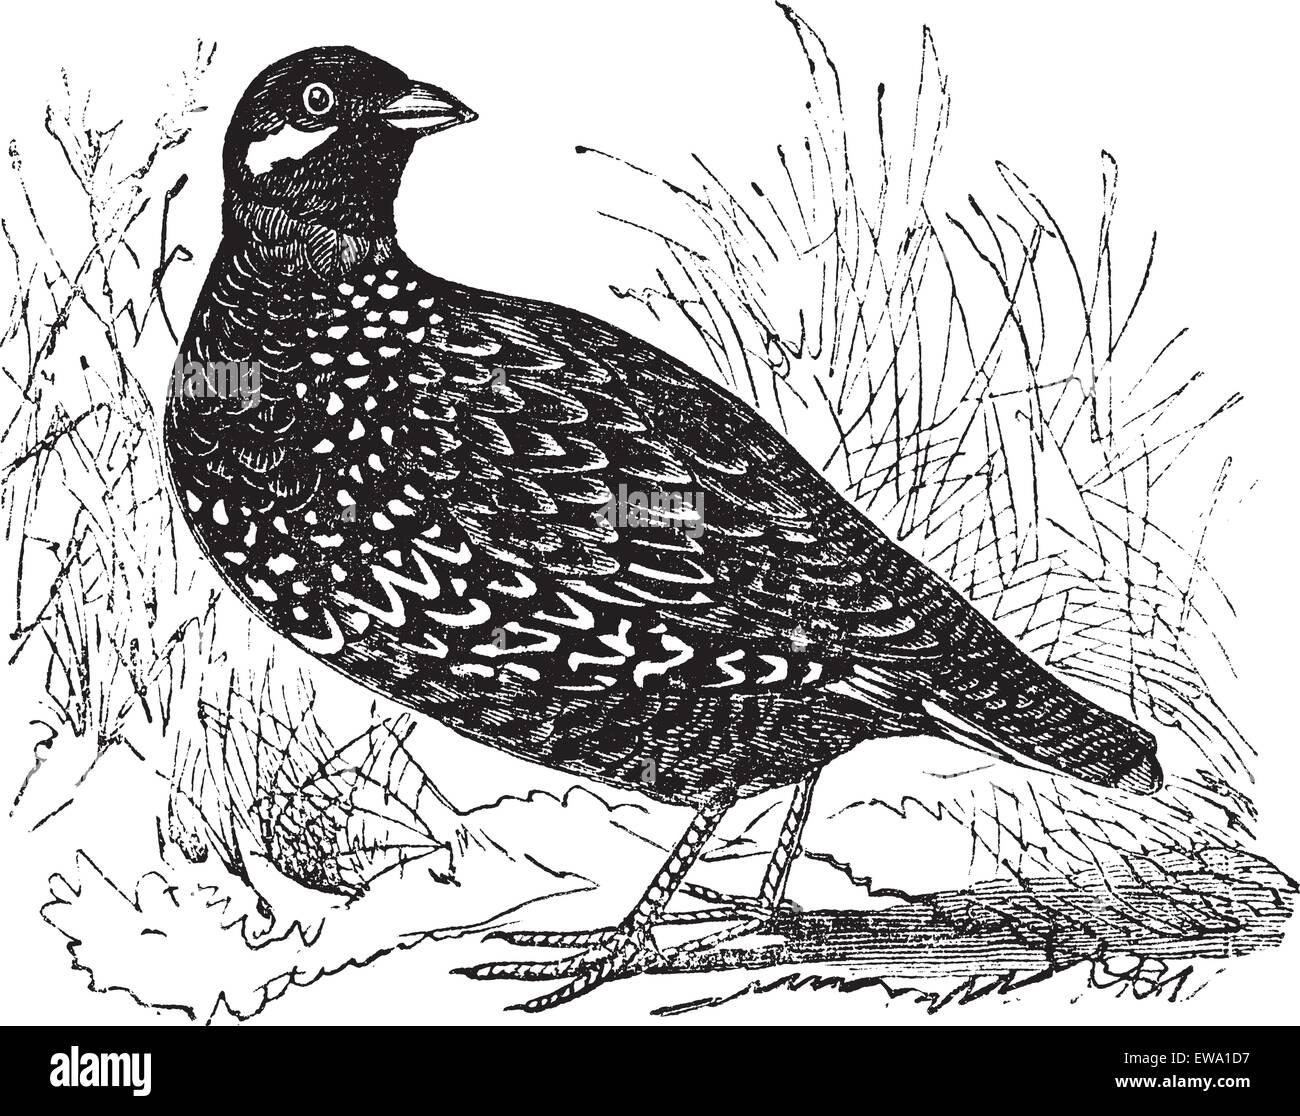 Black Francolin also known as  Francolinus francolinus,  gamebird,  vintage engraved illustration of Black Francolin. - Stock Vector